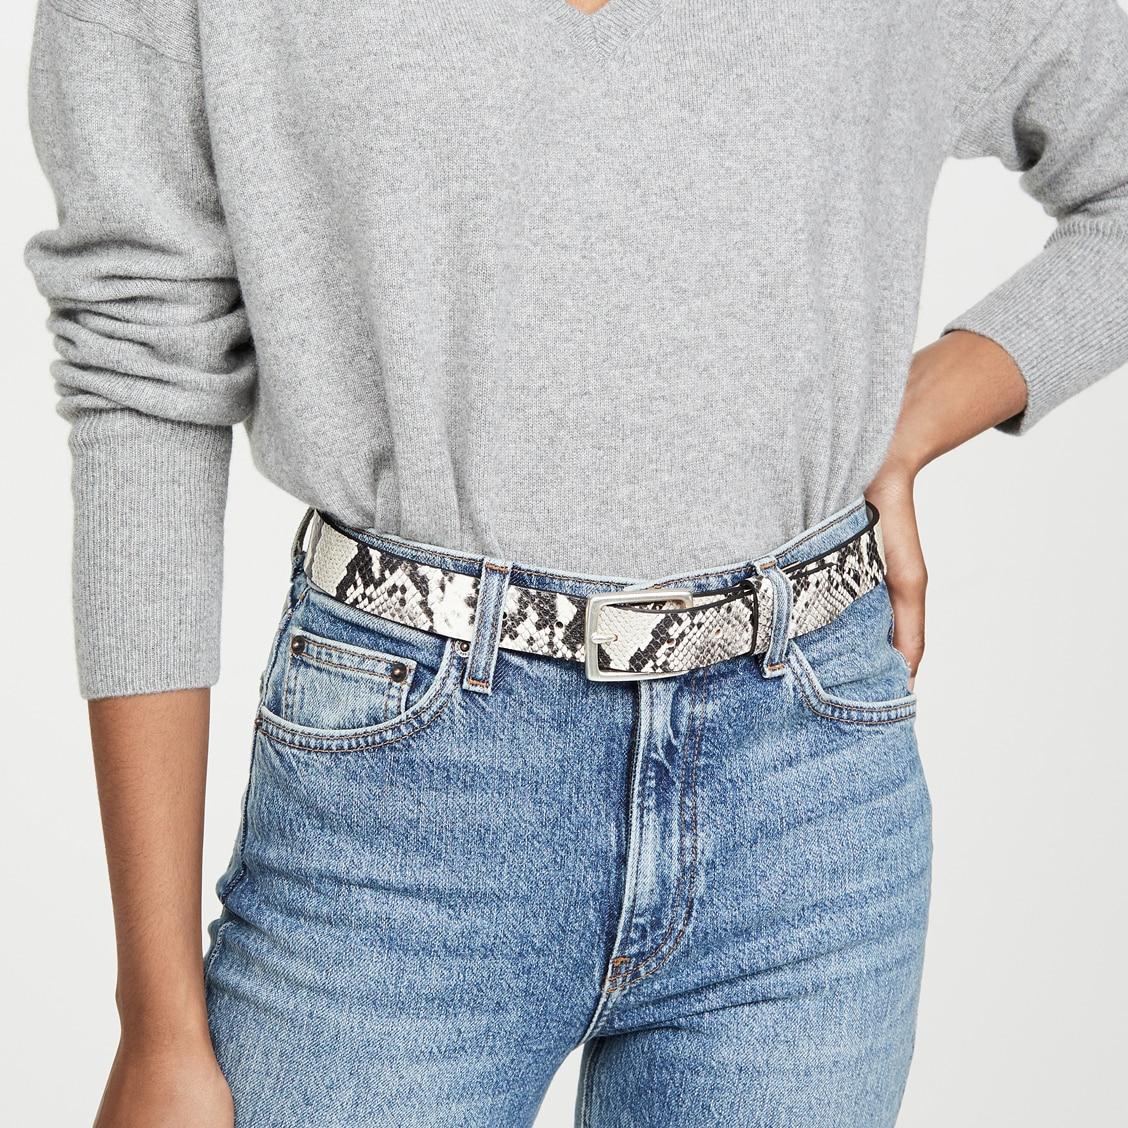 Dvacaman Snake Print Leather Belt For Women Boyfriend Style Square Buckle Waist Belt Punk Girls Accessories Wholesale Party Gift